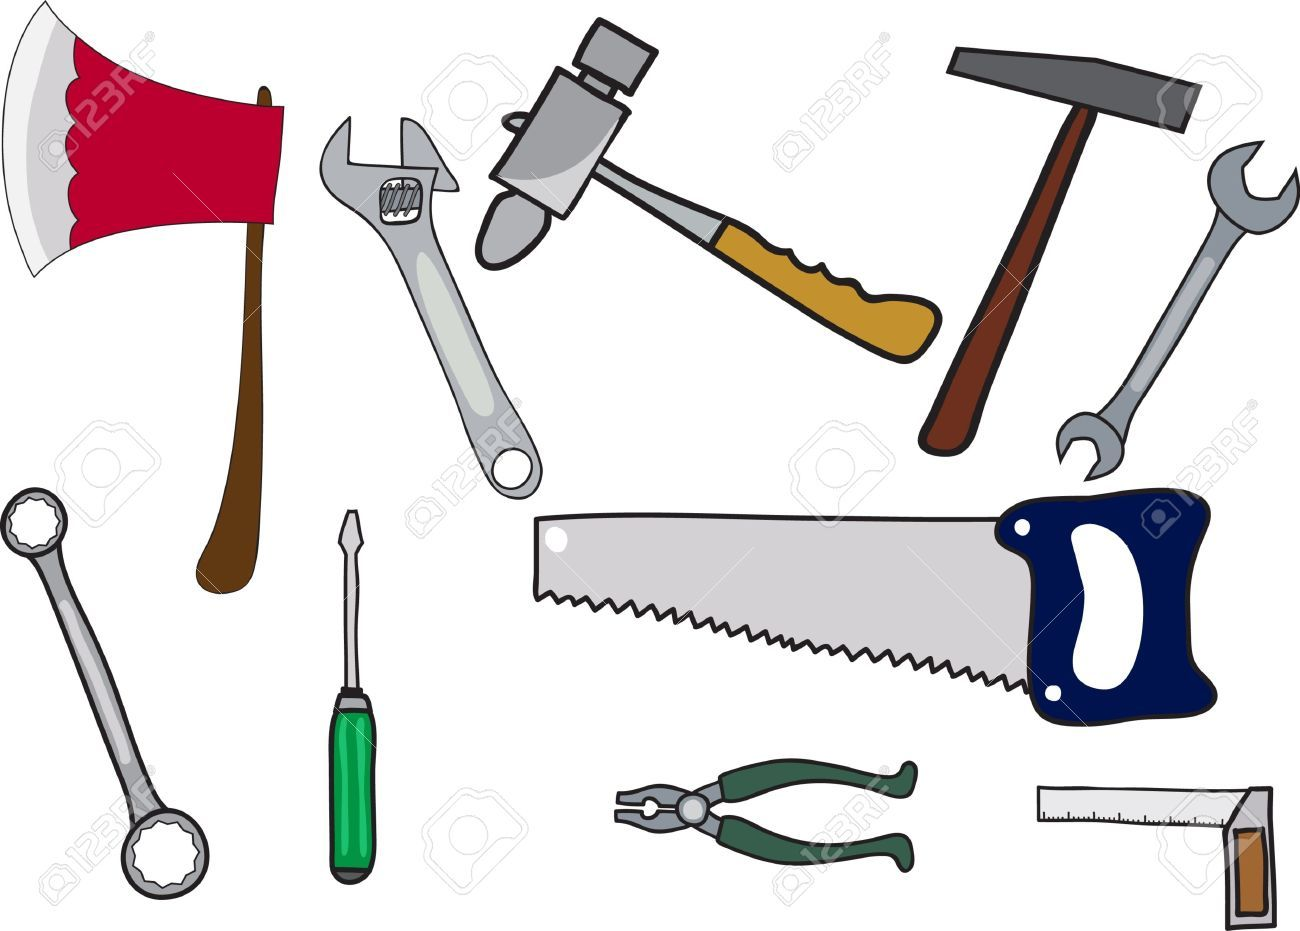 Carpenter services in bangalore carpentry services